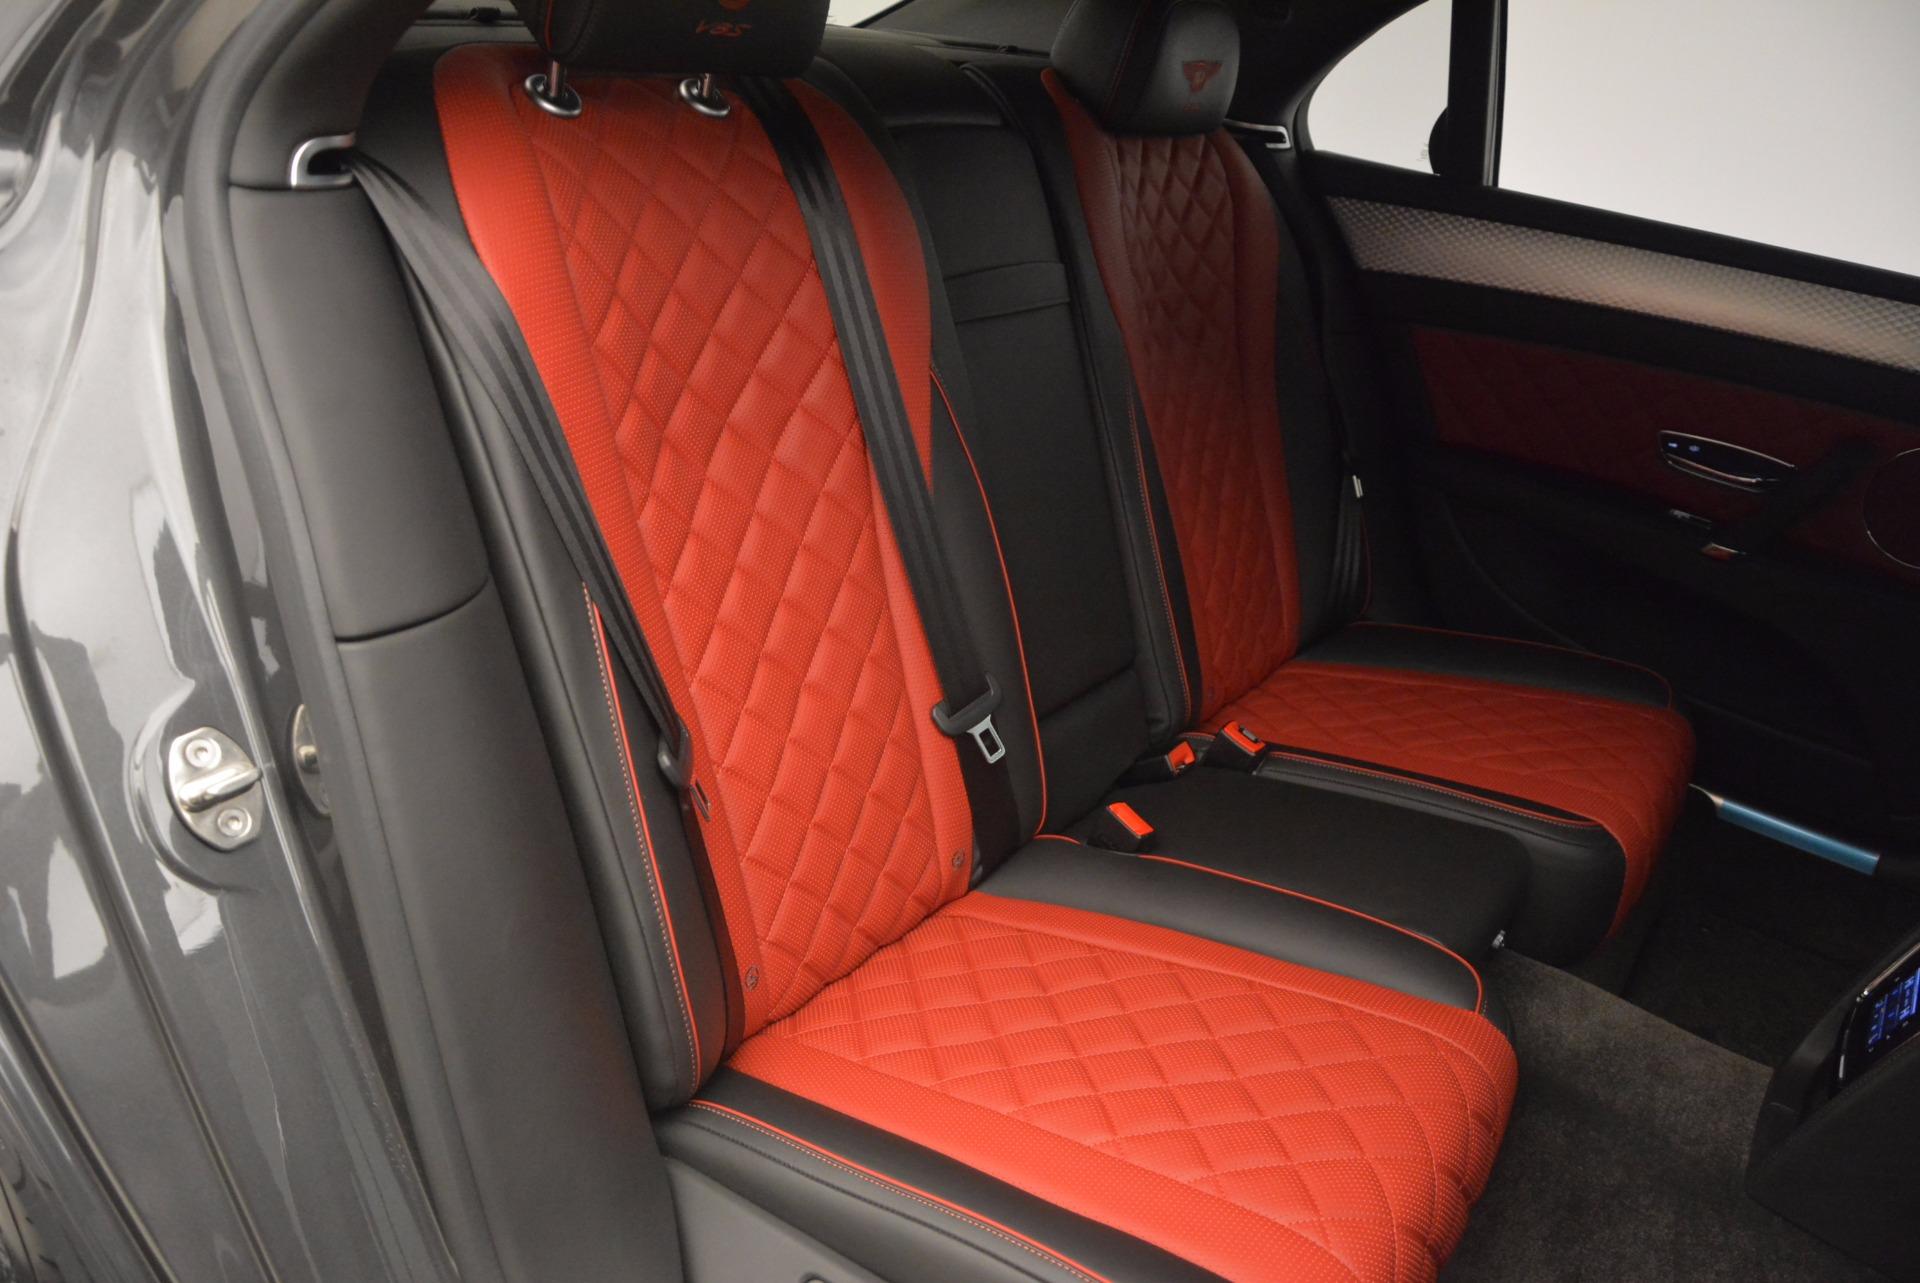 Used 2017 Bentley Flying Spur V8 S For Sale In Westport, CT 875_p49